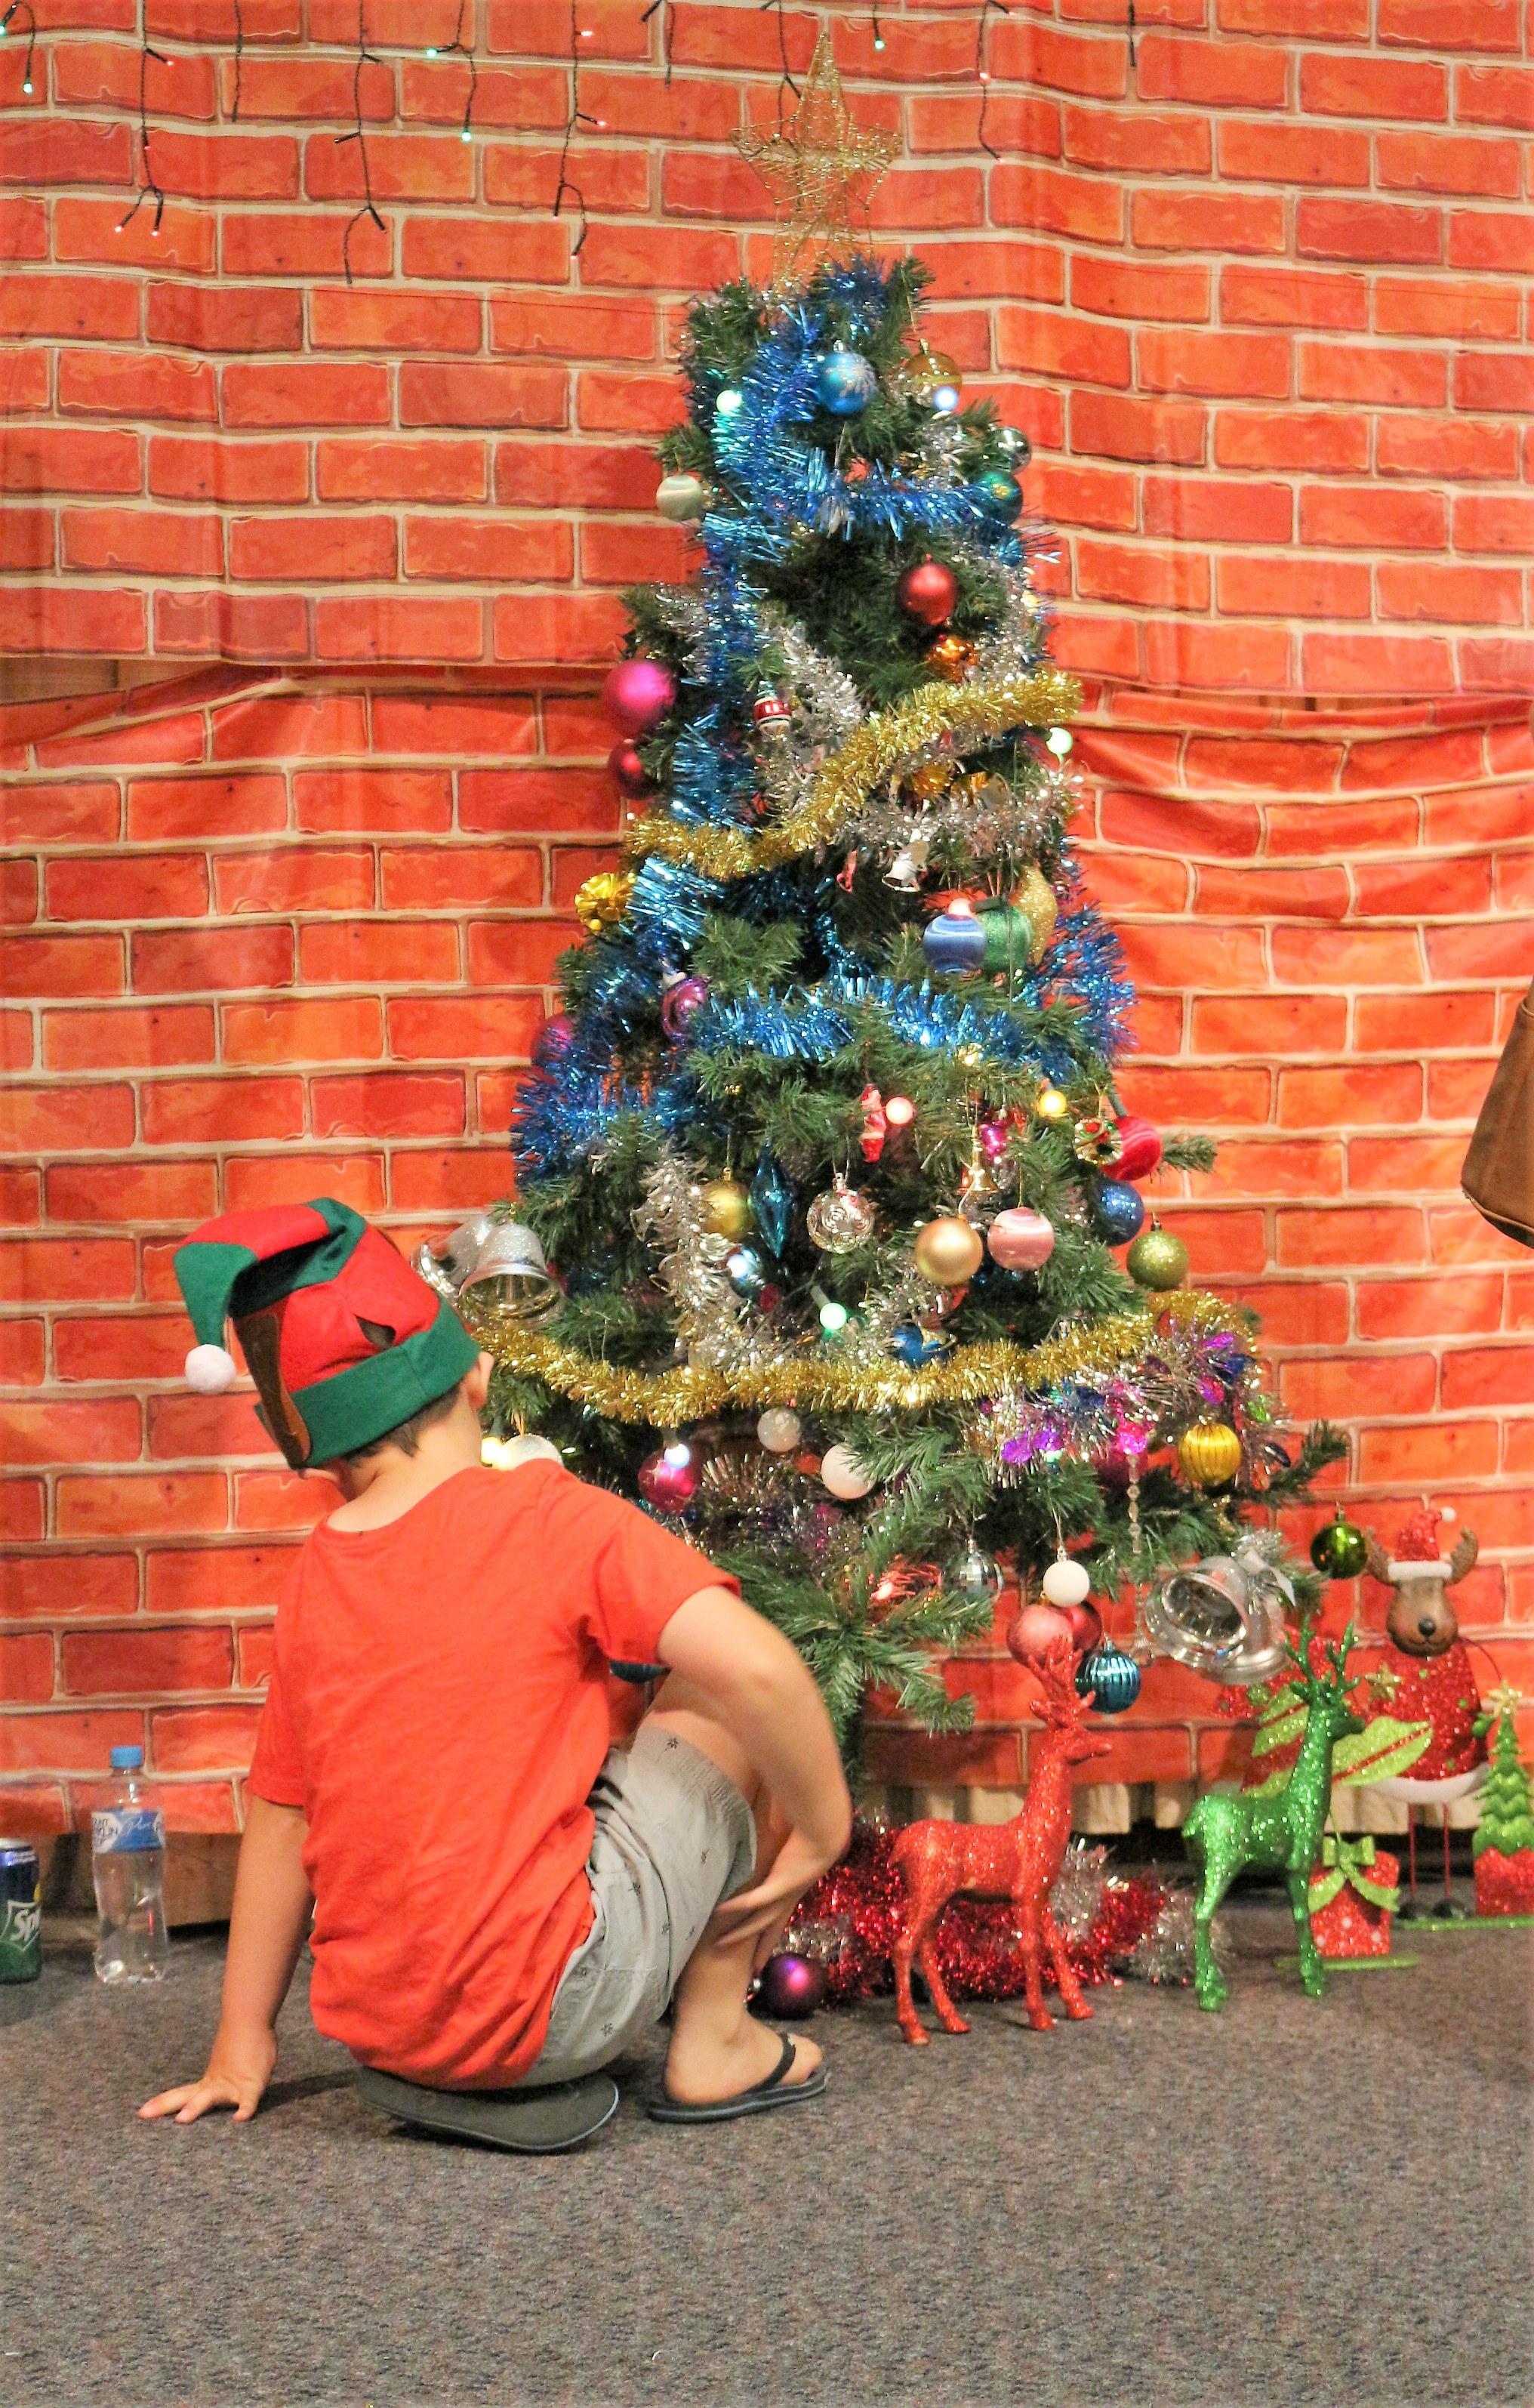 Kid under the Christmas tree